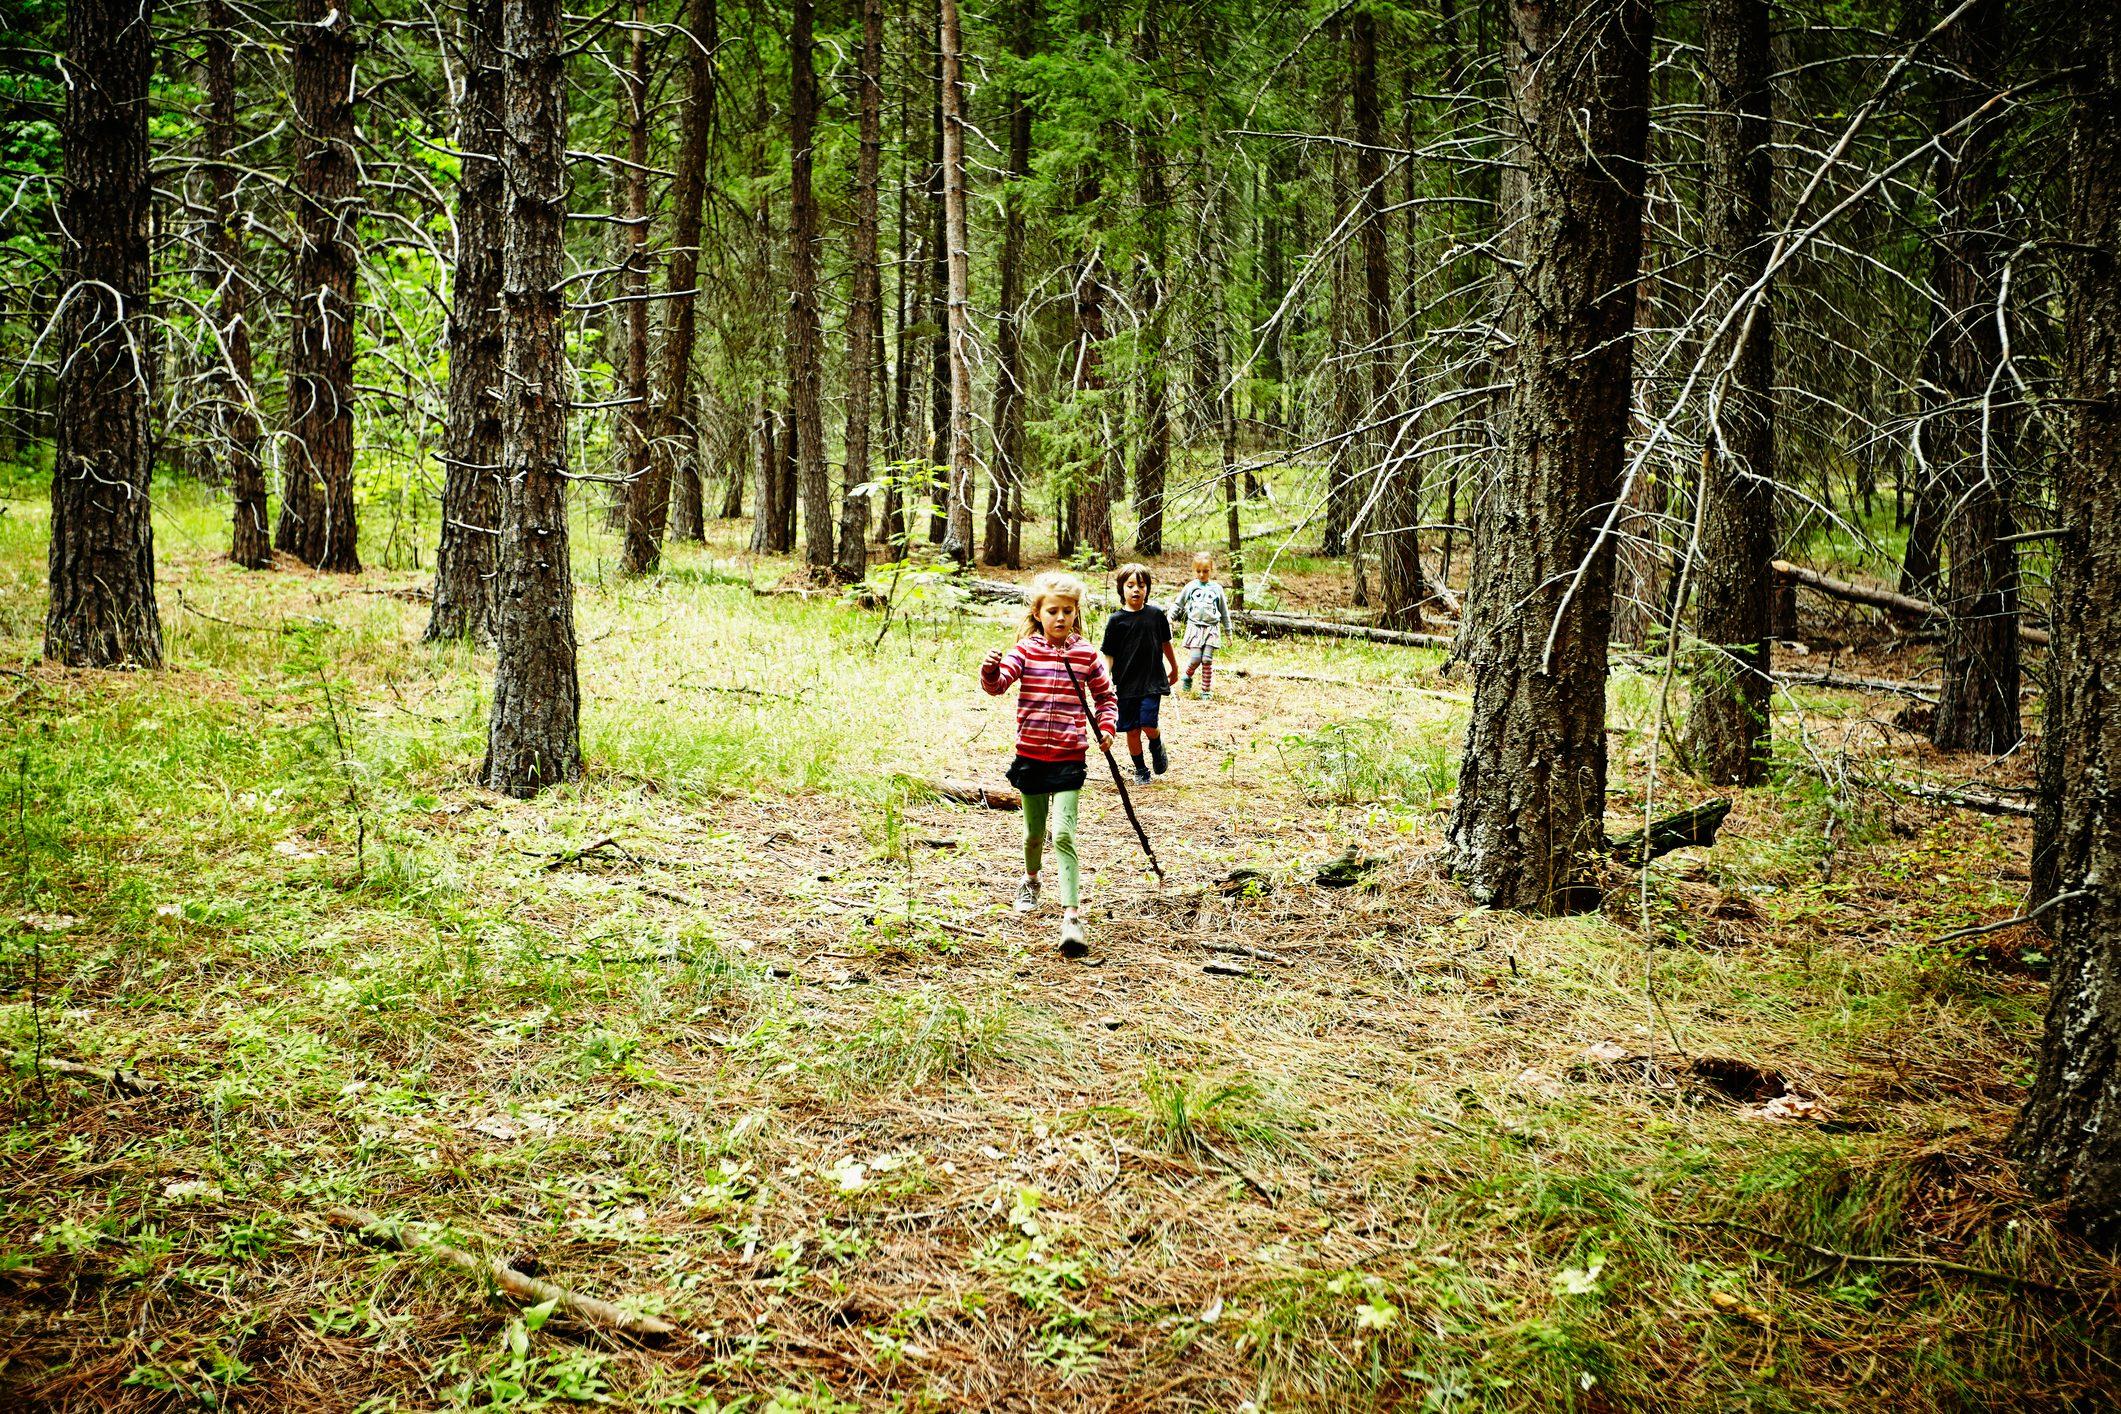 Three kids hiking through woods at camp